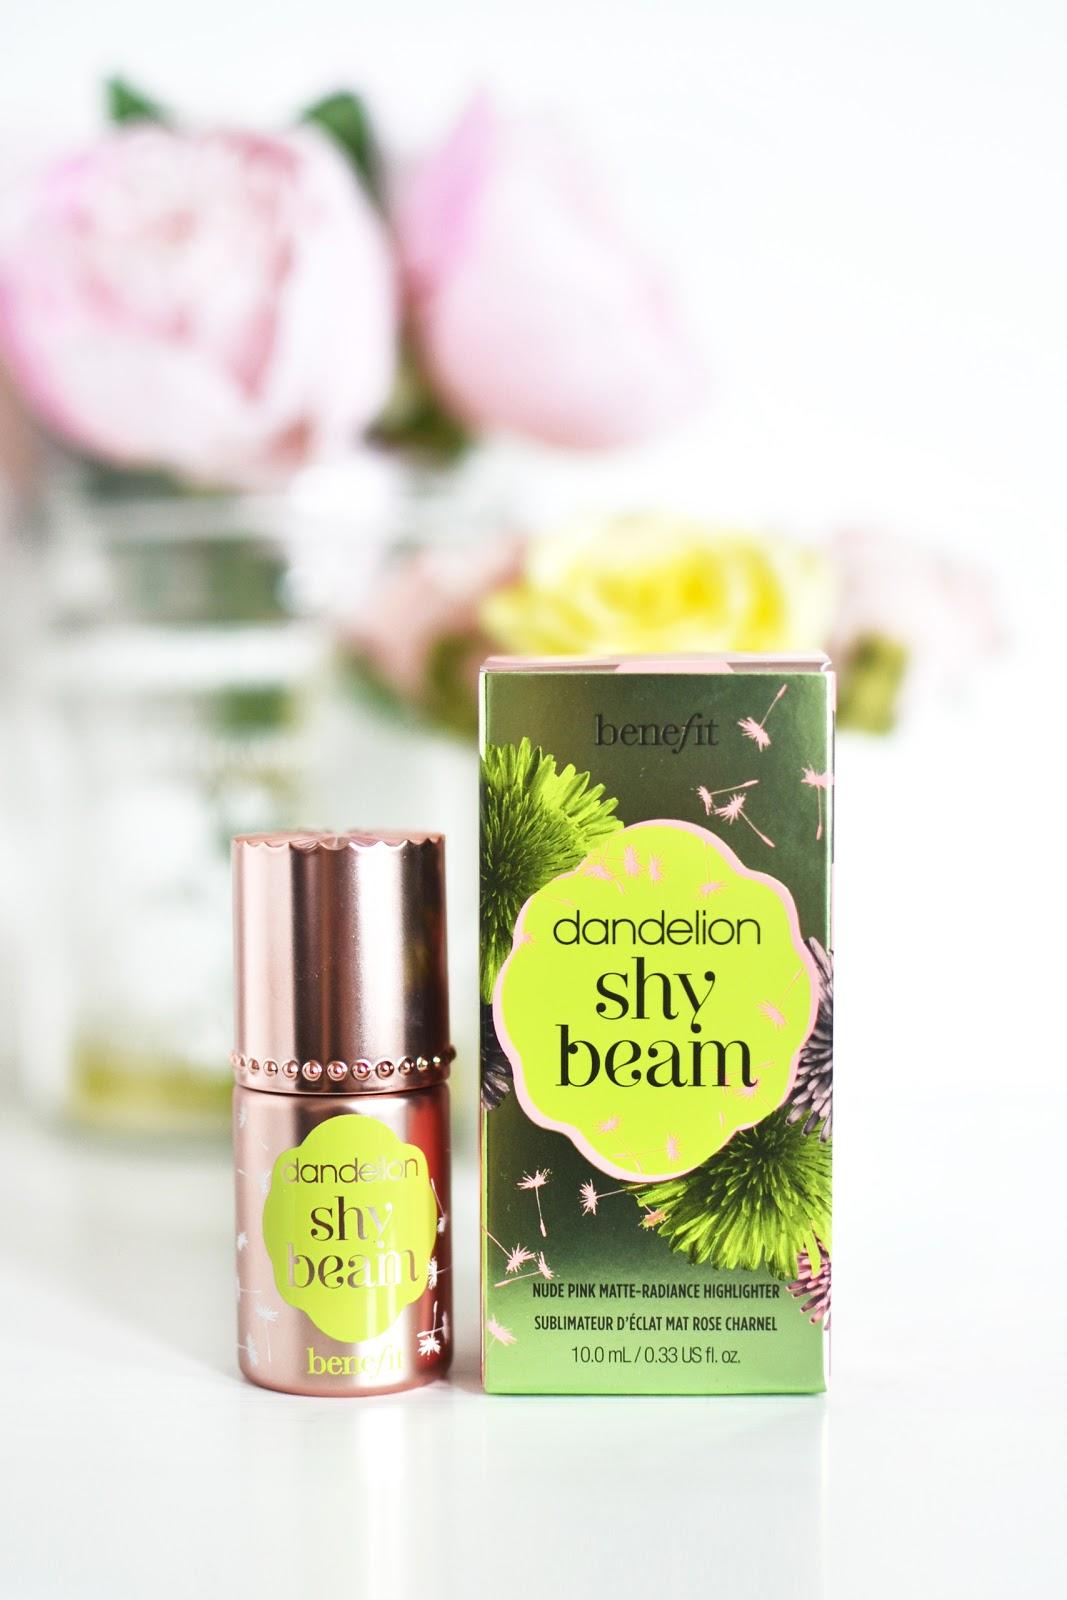 Benefit's Dandelion Shy Beam